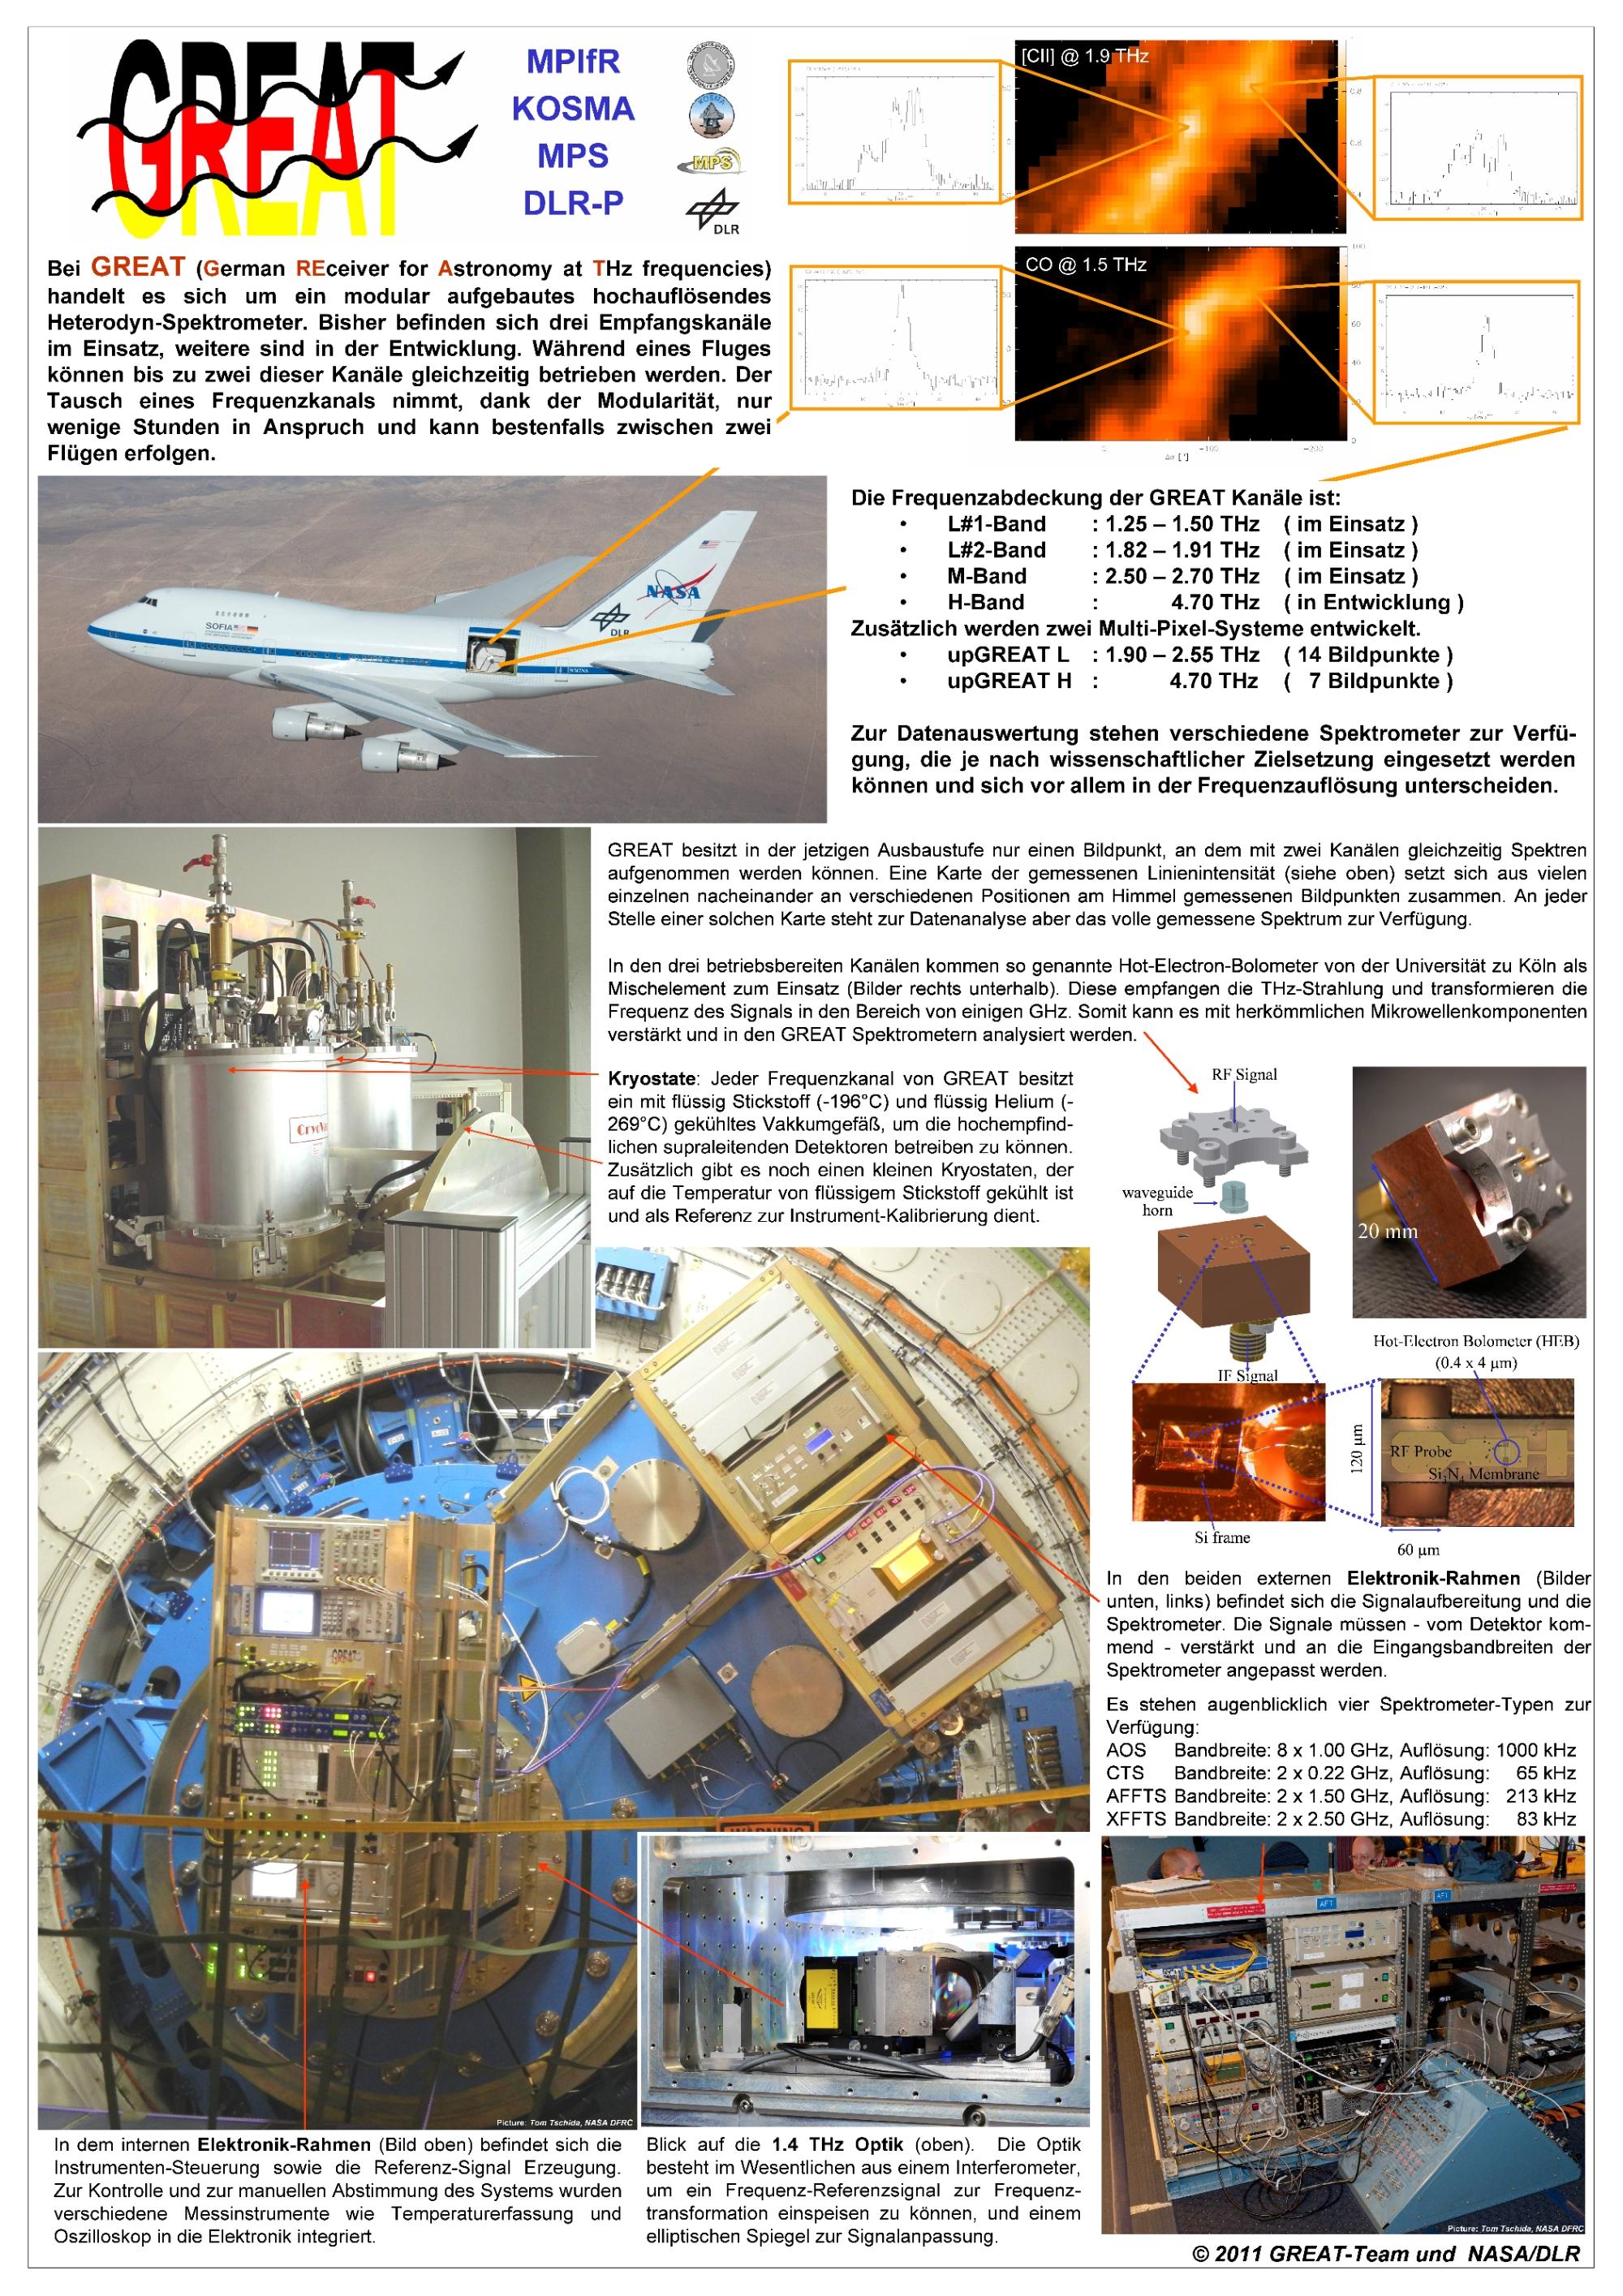 https://opencms.uni-stuttgart.de/project/dsi/img/infomaterial/plakate/GREAT_Infoposter_X_4_Drucke-page-0.jpg